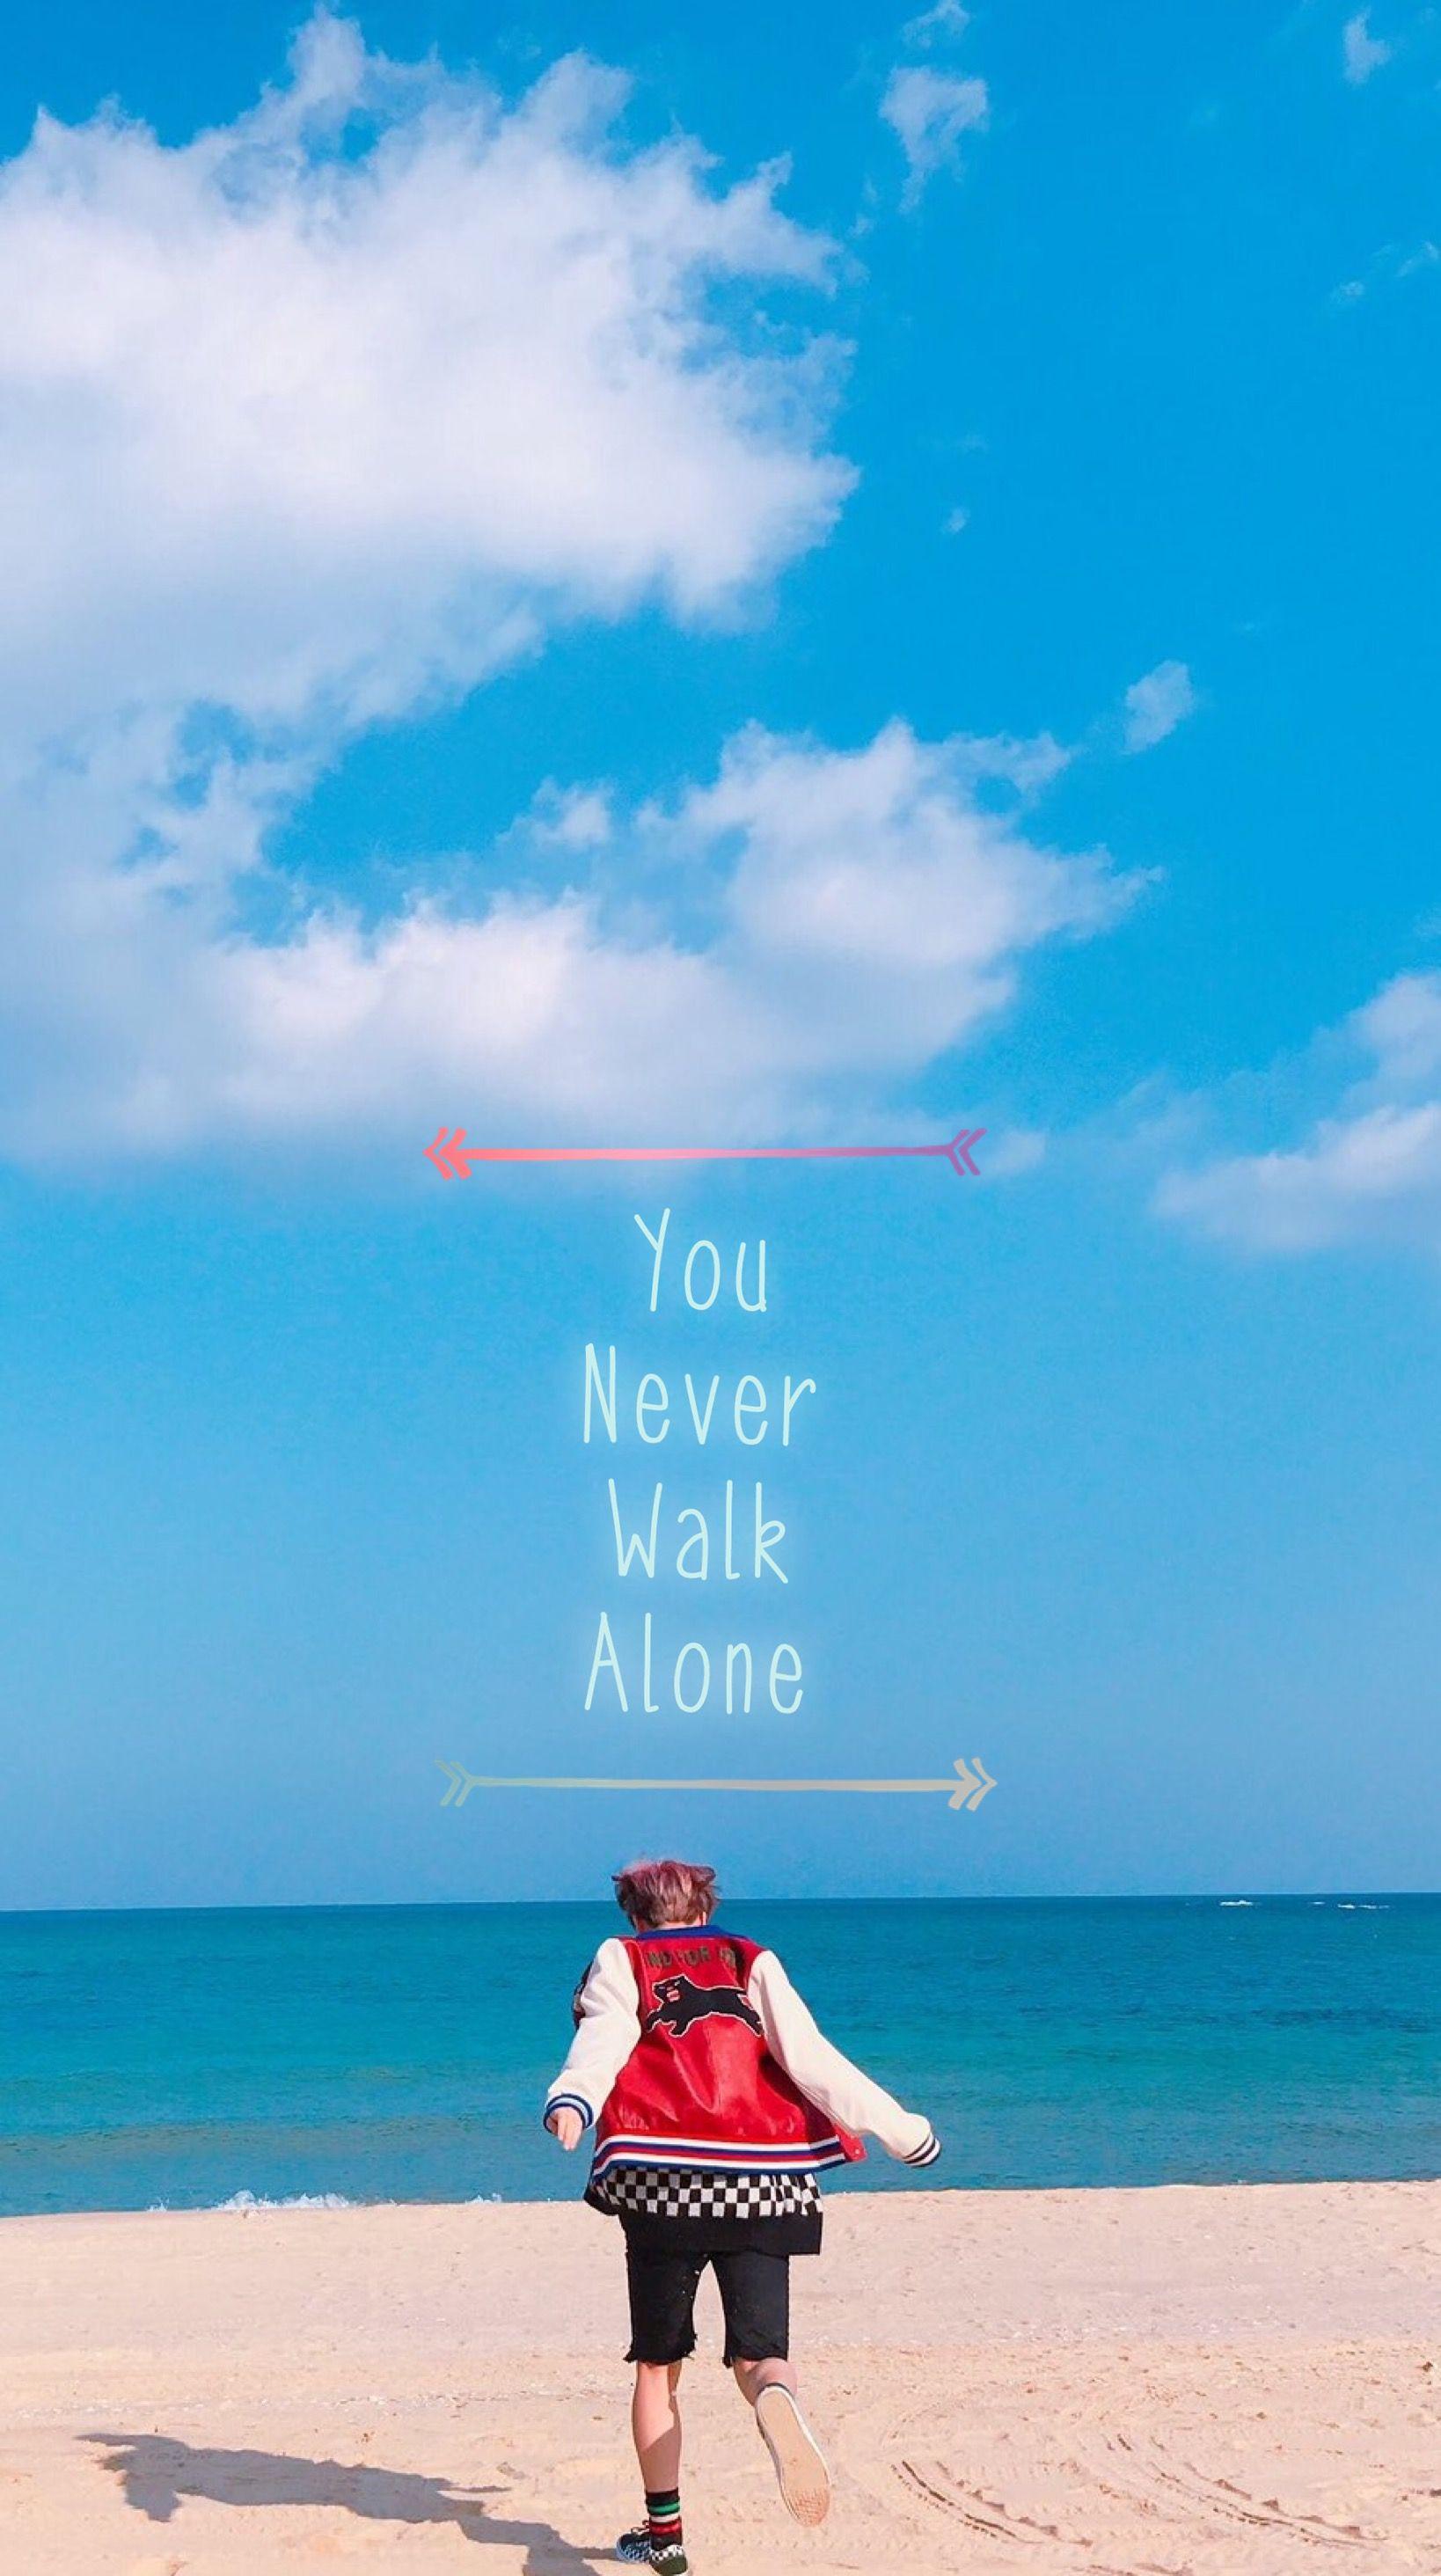 Bts You Never Walk Alone Wallpaper Bts Photo Bts You Never Walk Alone Bts Spring Day Bts wallpaper hd you never walk alone